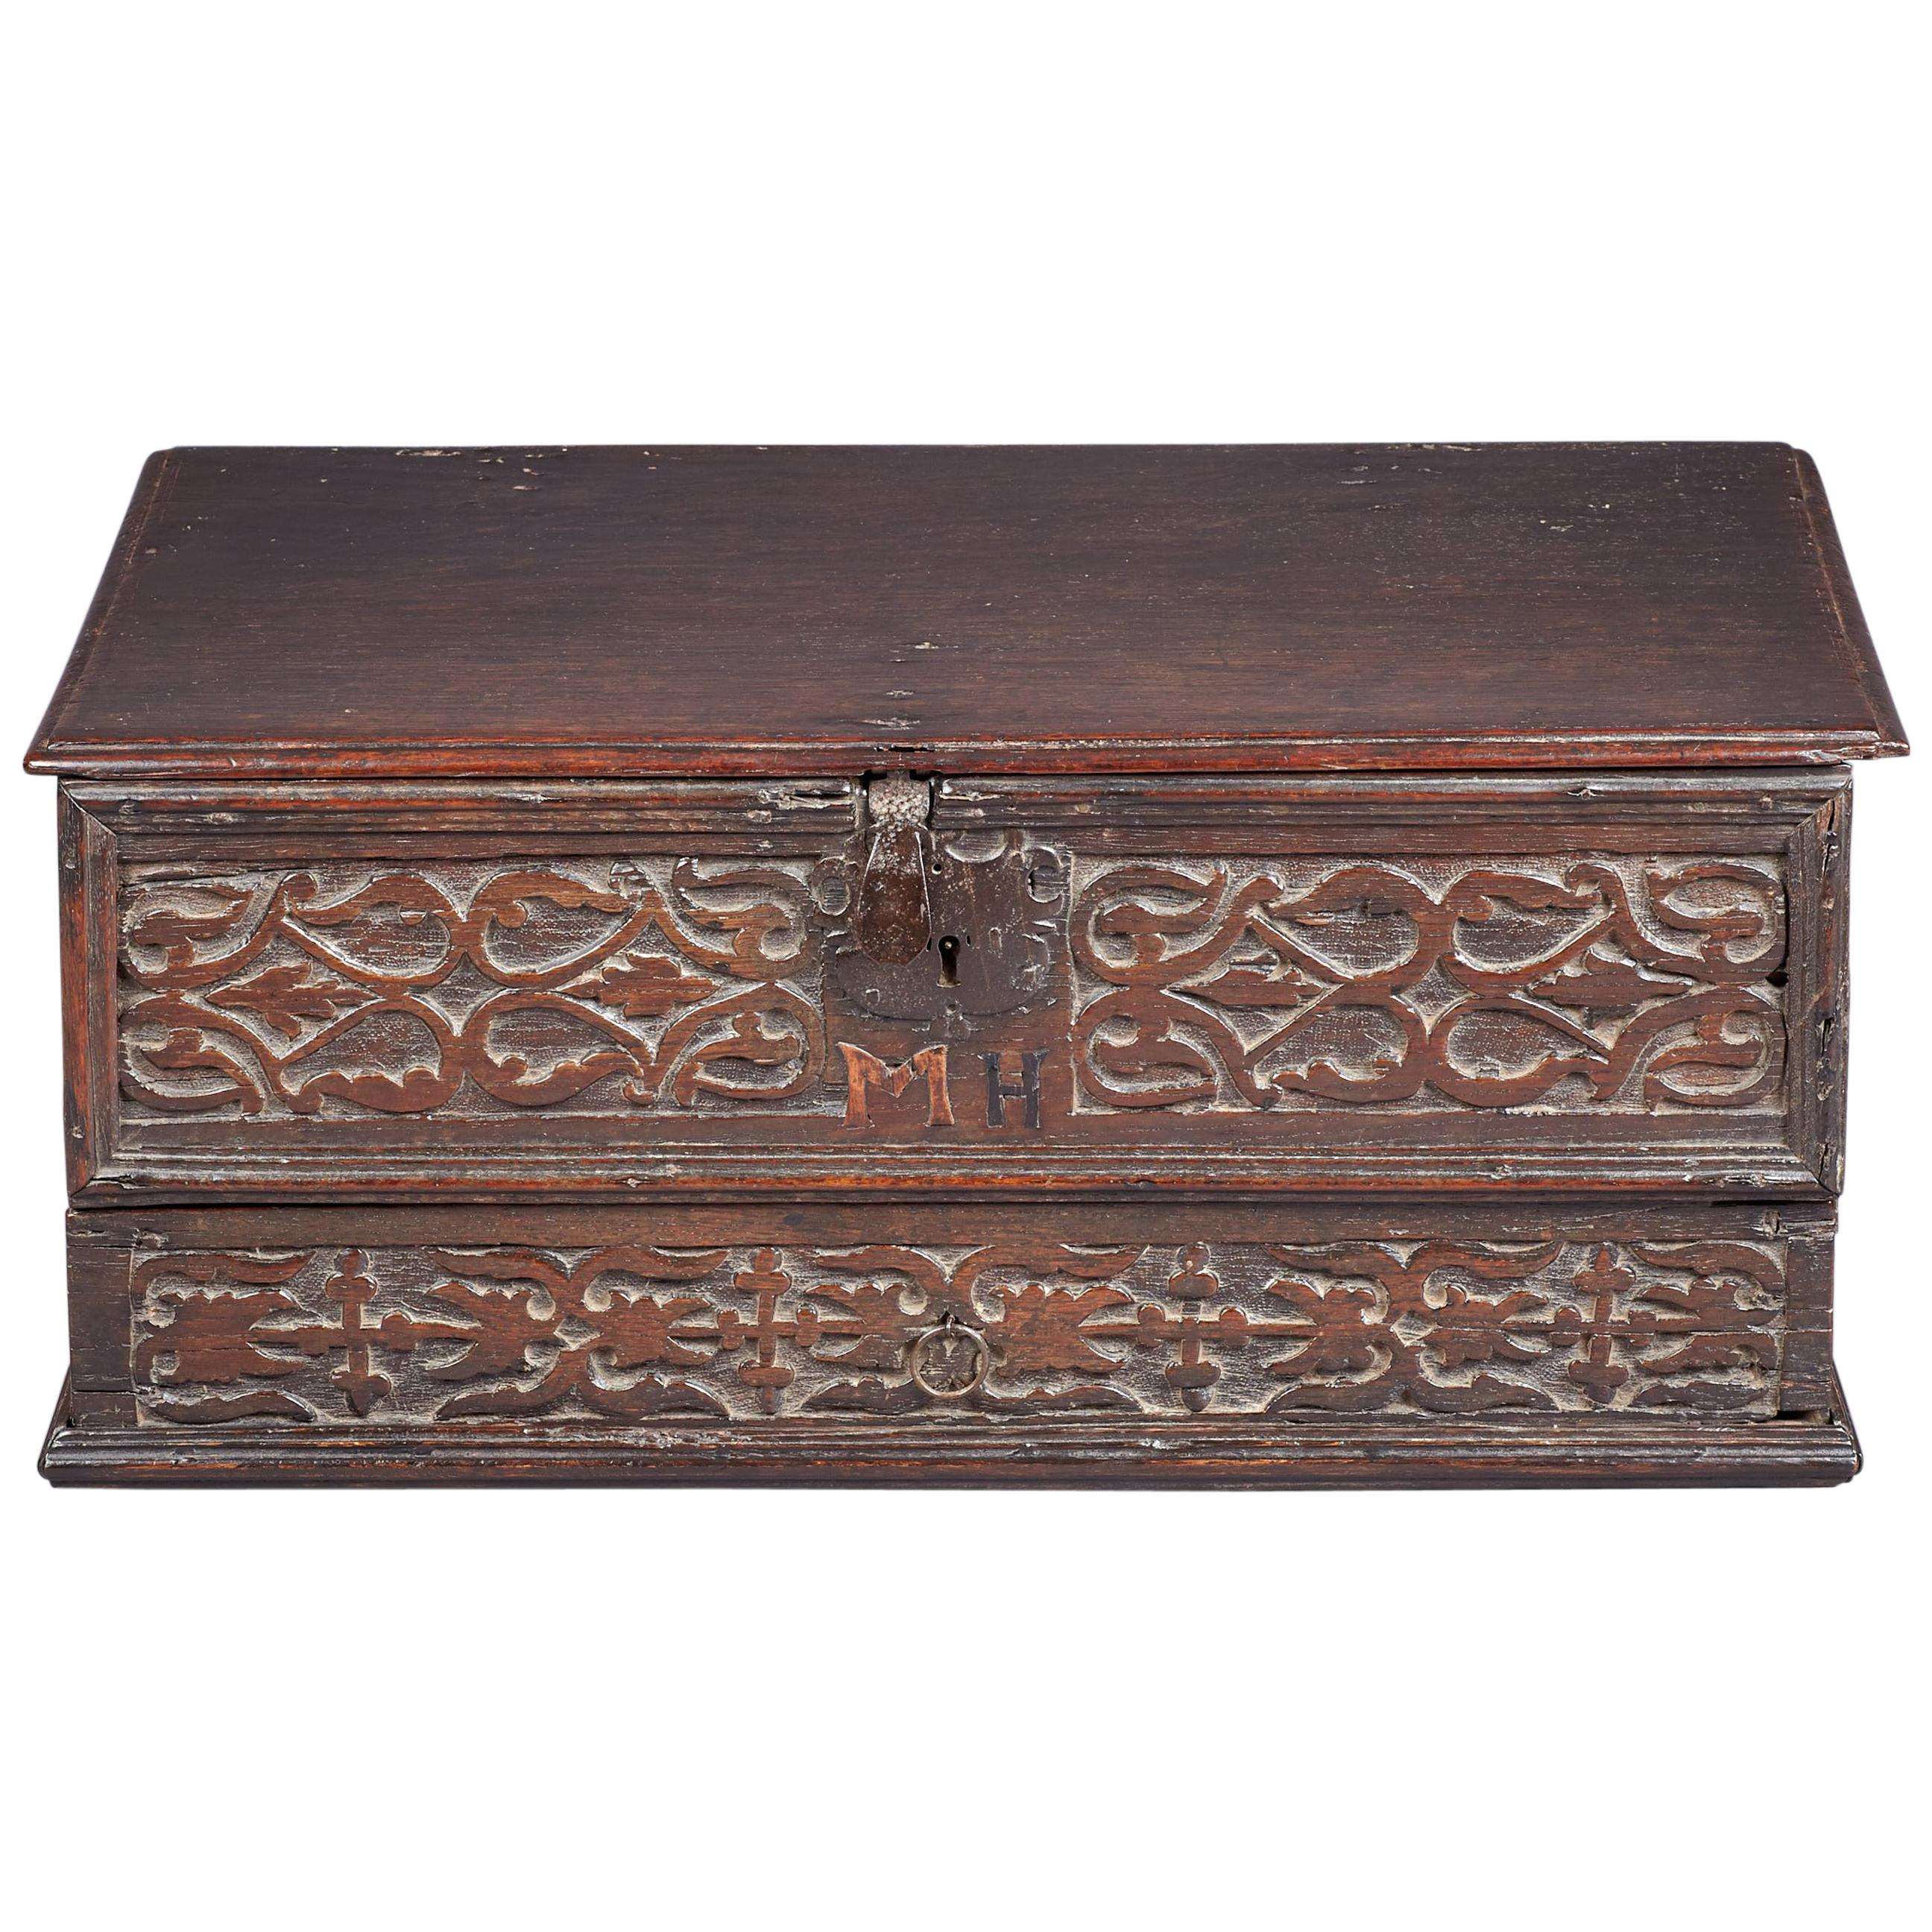 Inlaid Oak Desk Box, Charles II period, Yorkshire, circa 1660-1680